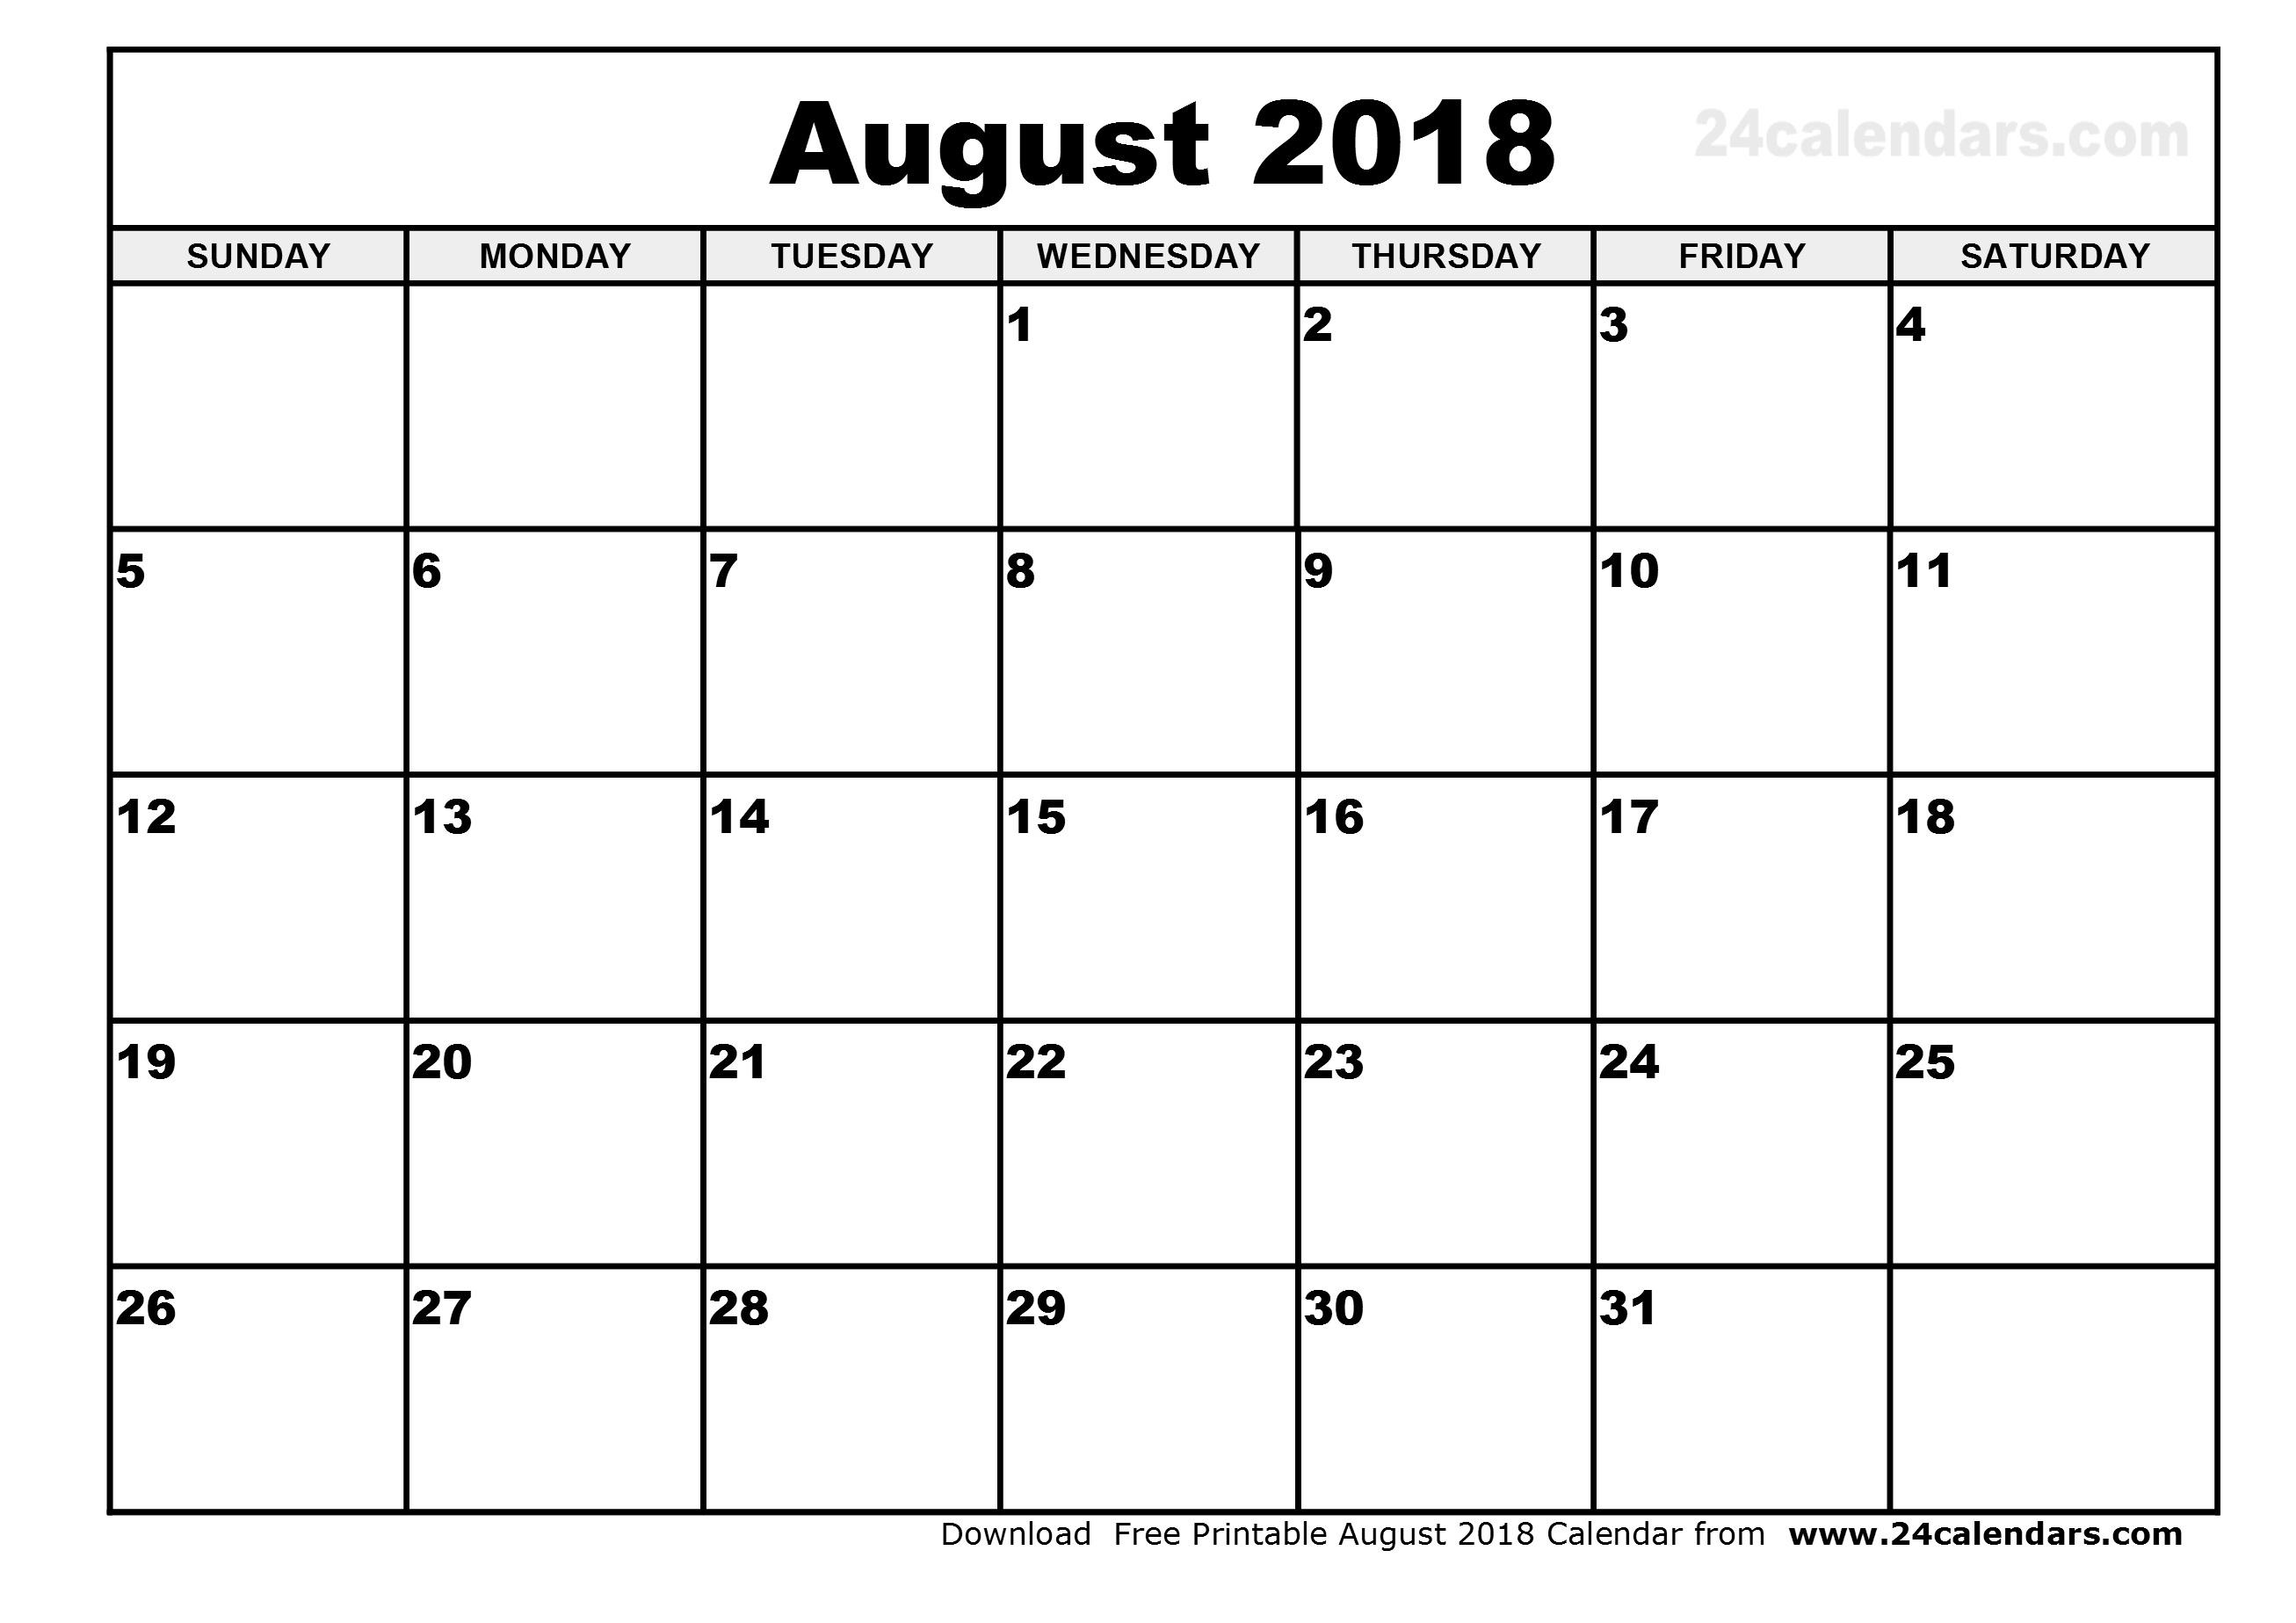 August 2018 Monthly Calendar Printable Flogfolioweekly Com Pleasing  Free Printable Month By Month Calendars